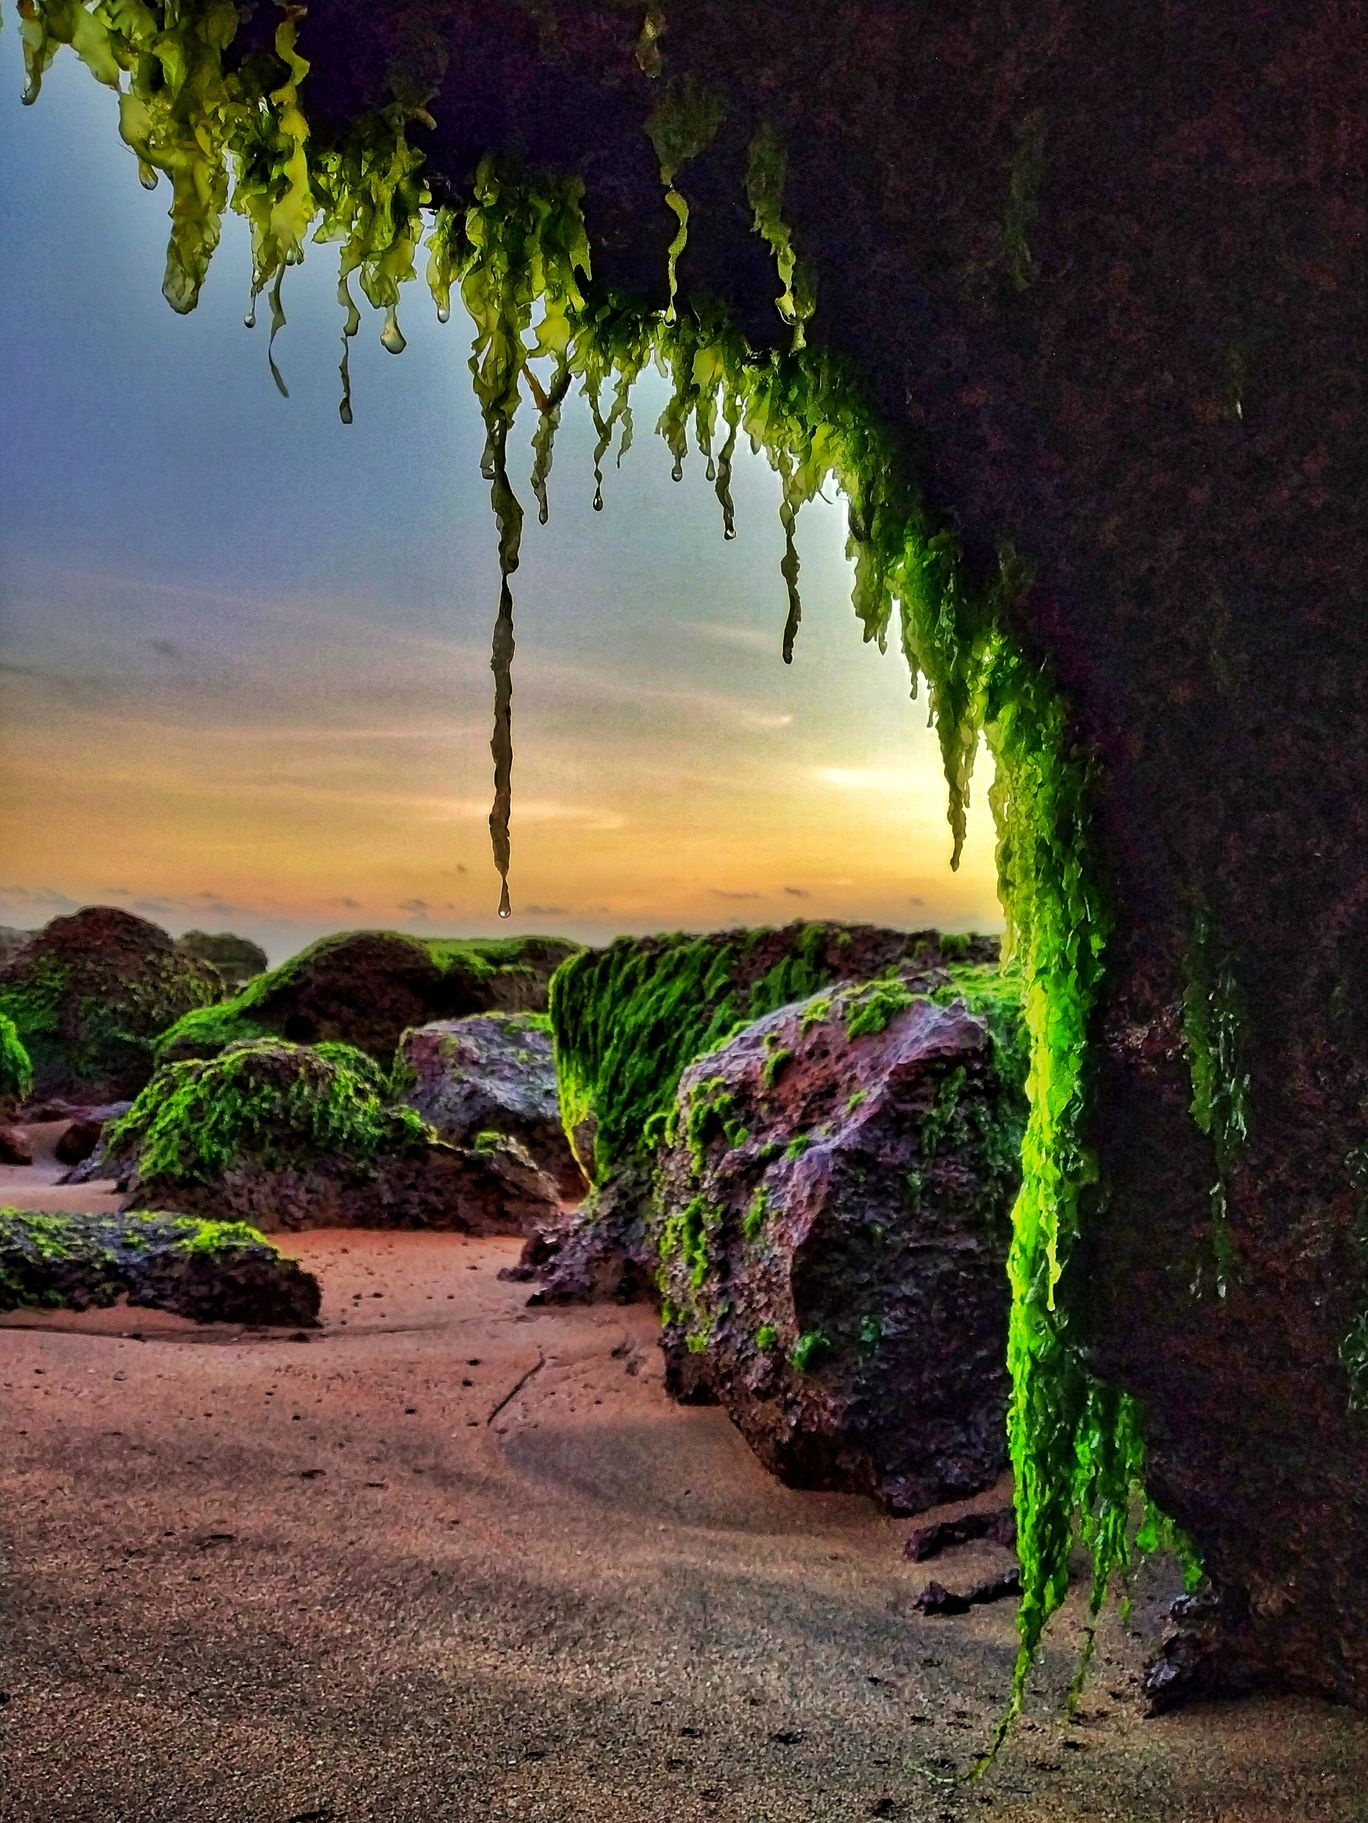 Photo of Goa By Diptanshu Chhadimali